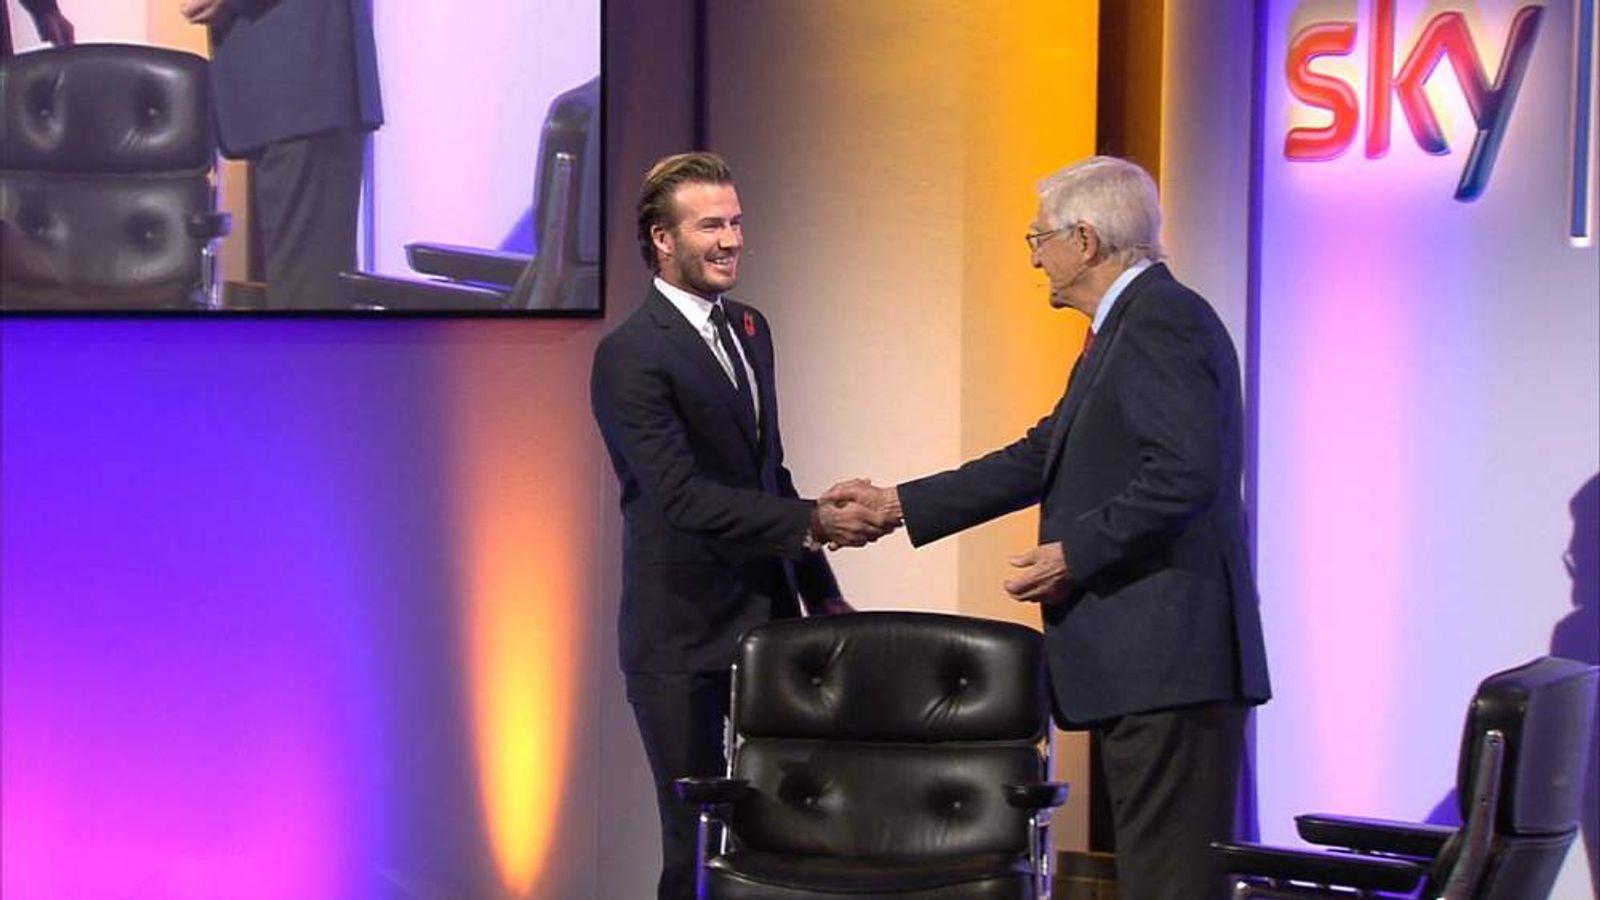 David Beckham and Sir Michael Parkinson